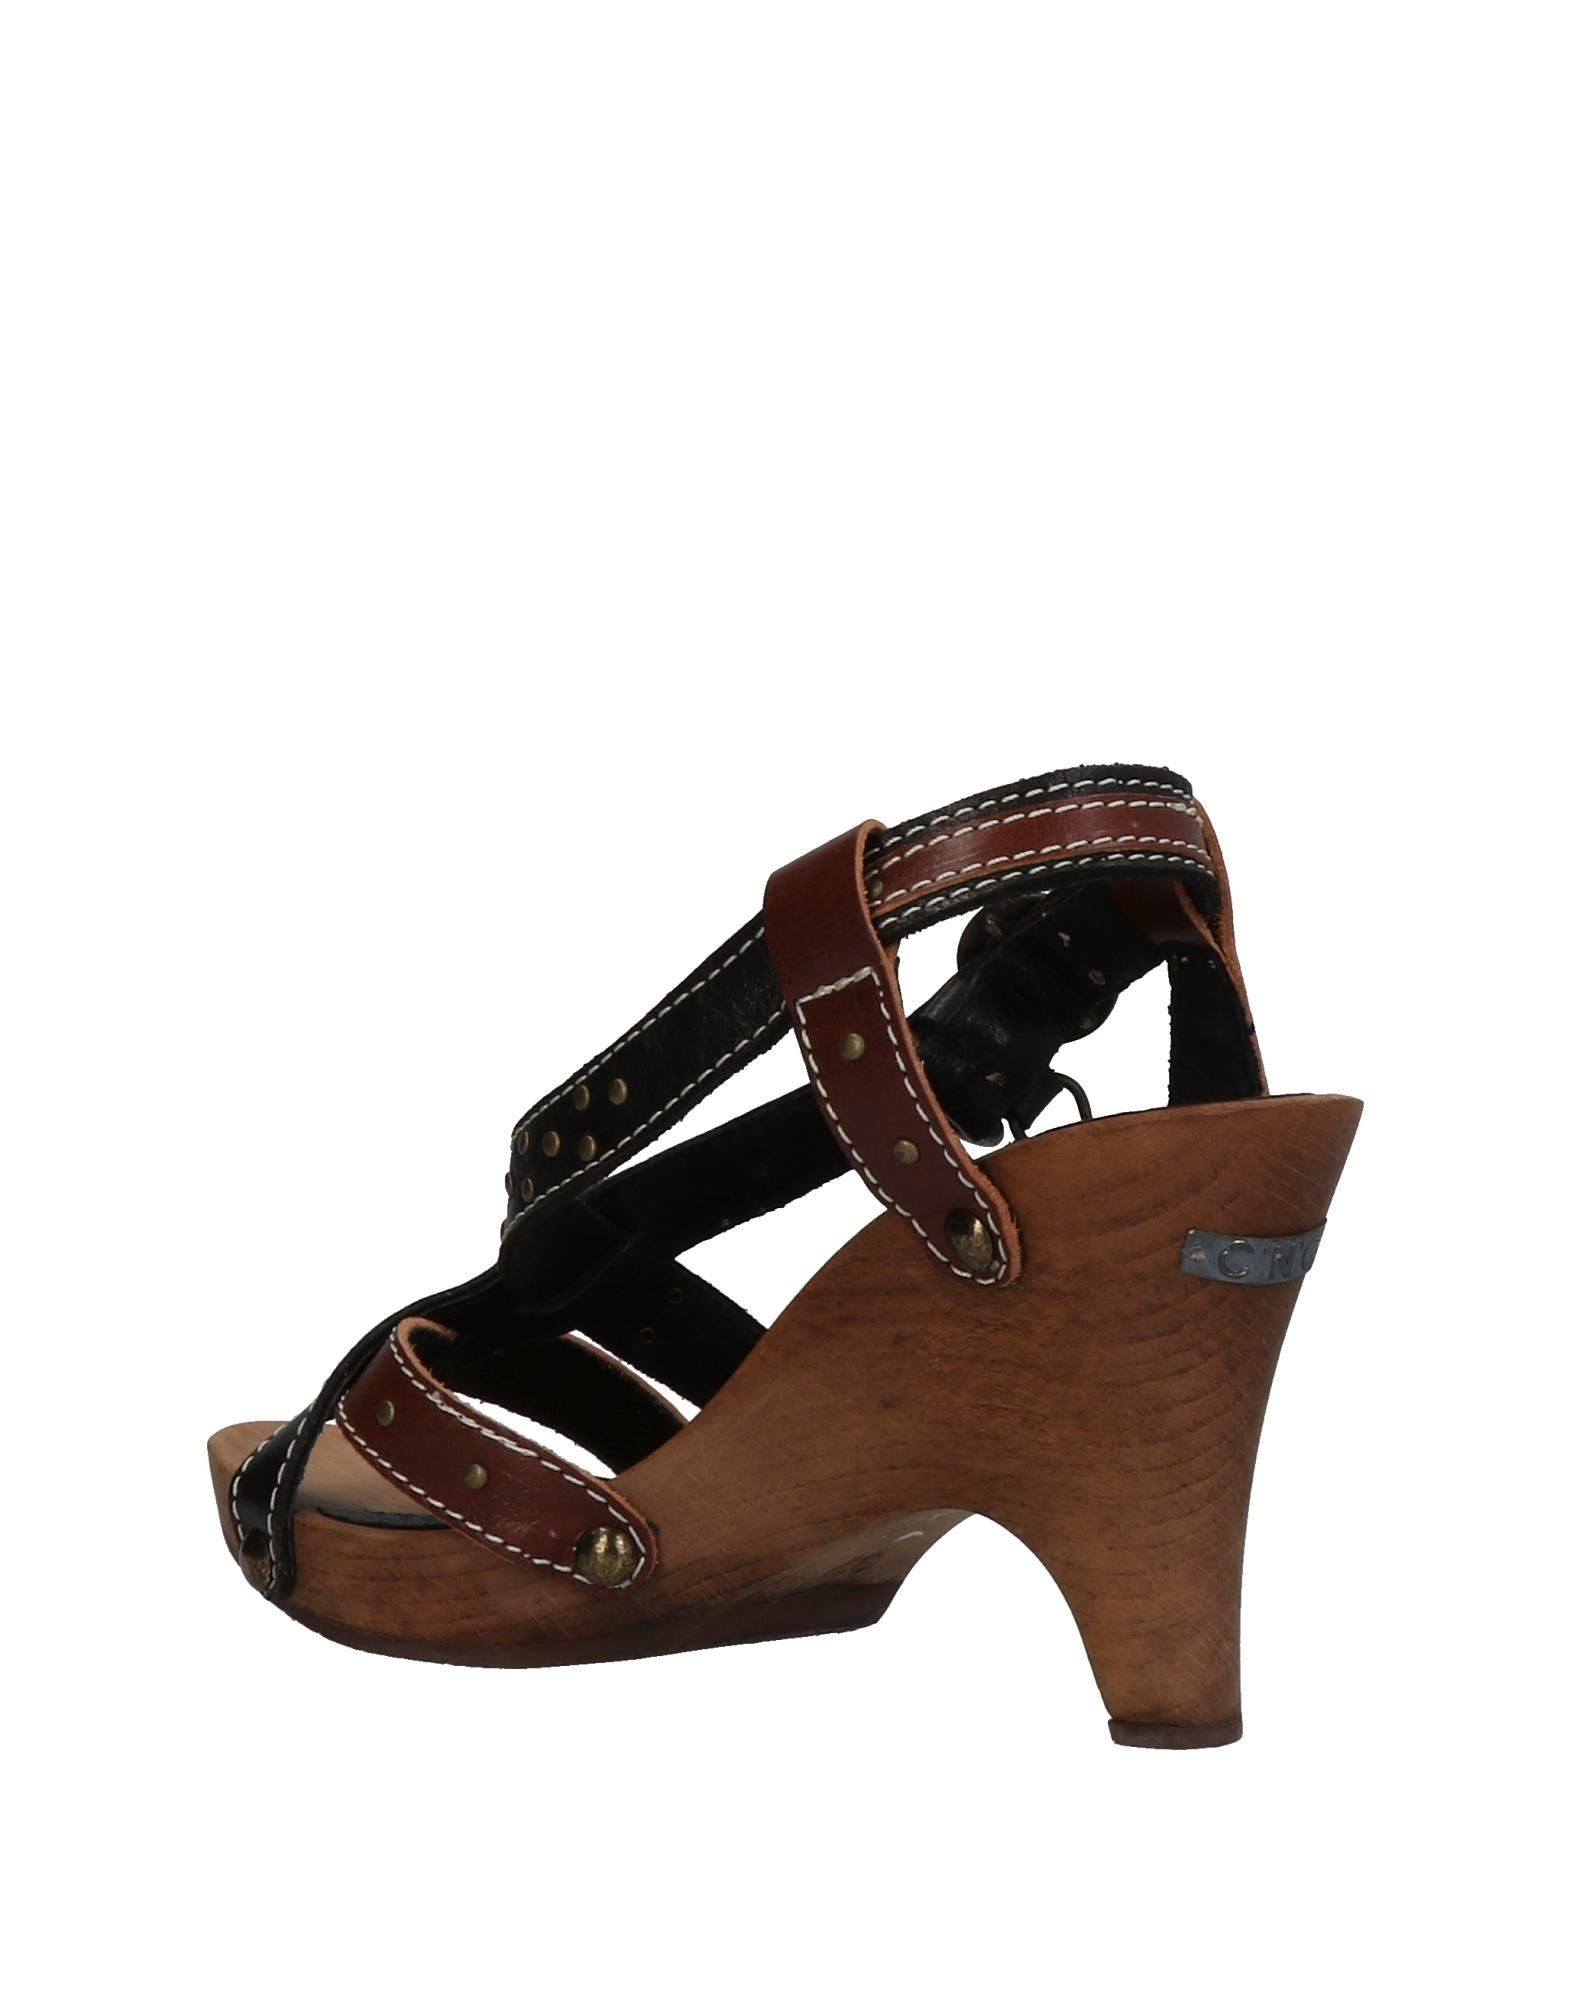 C'n'c' Costume National Sandalen Damen Damen Damen  11422141FA Gute Qualität beliebte Schuhe fbc00e